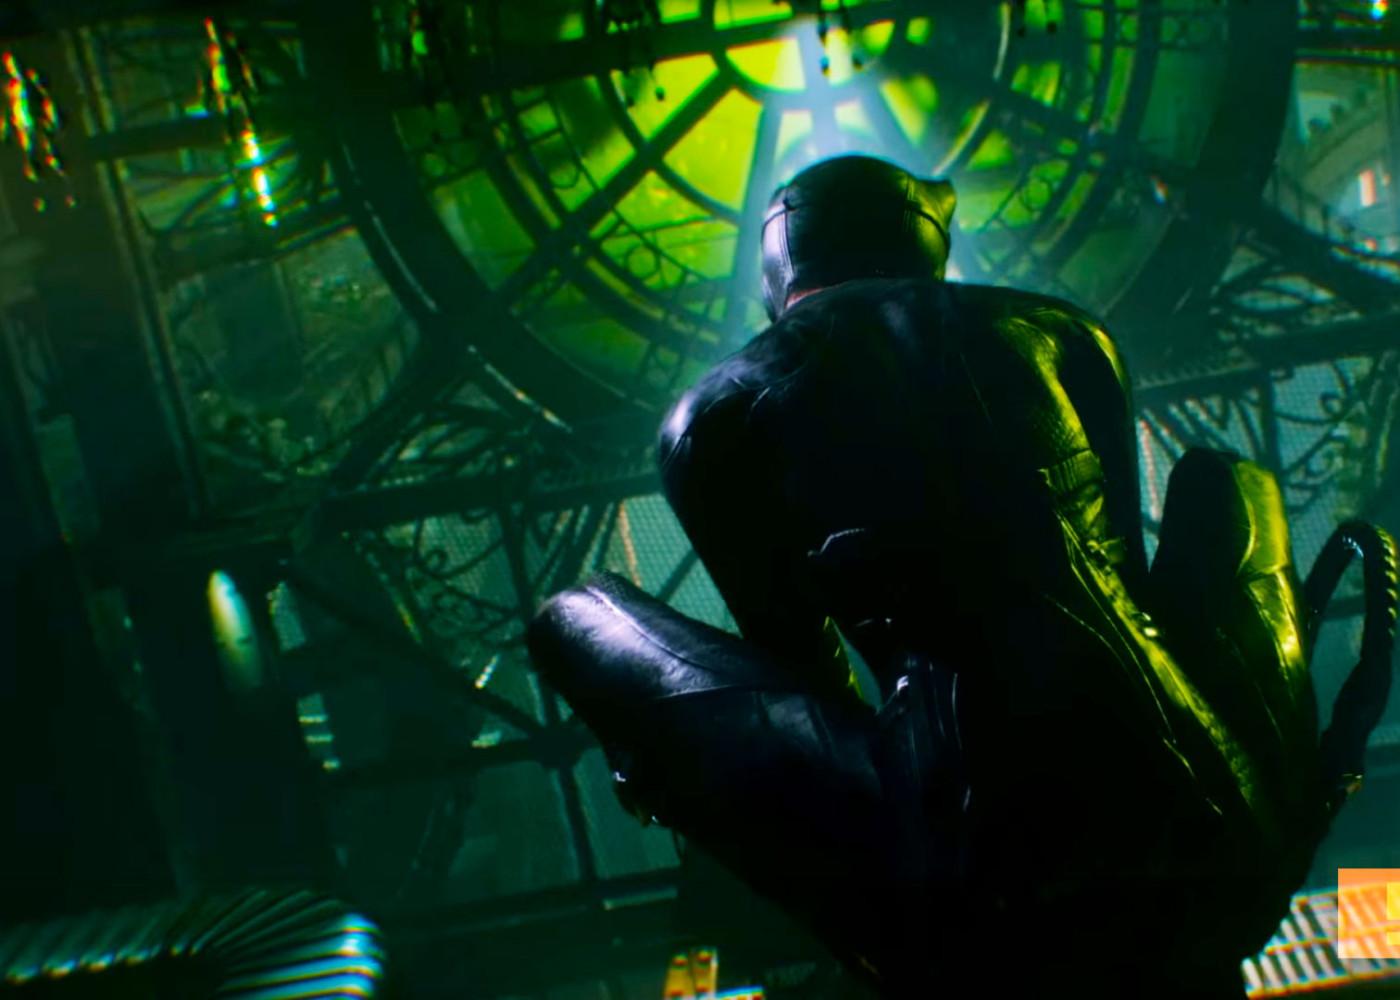 batman arkham knight dlc. catwoman. the action pixel. @theactionpixel. Rocksteady games.